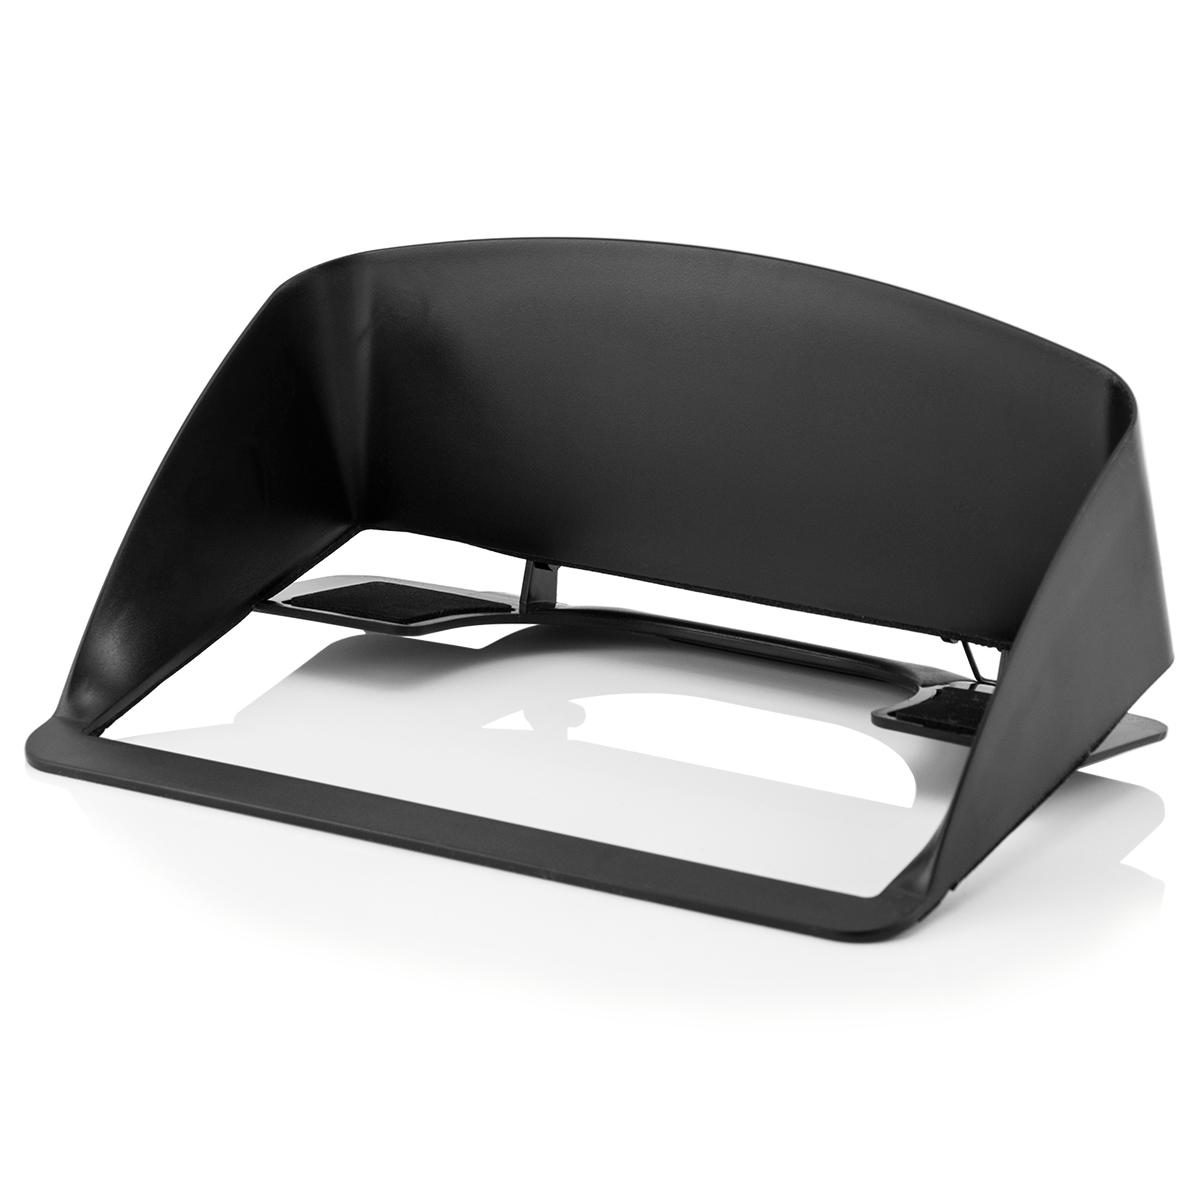 universal sonnenblende sonnenschutz sonnen blendschutz f. Black Bedroom Furniture Sets. Home Design Ideas